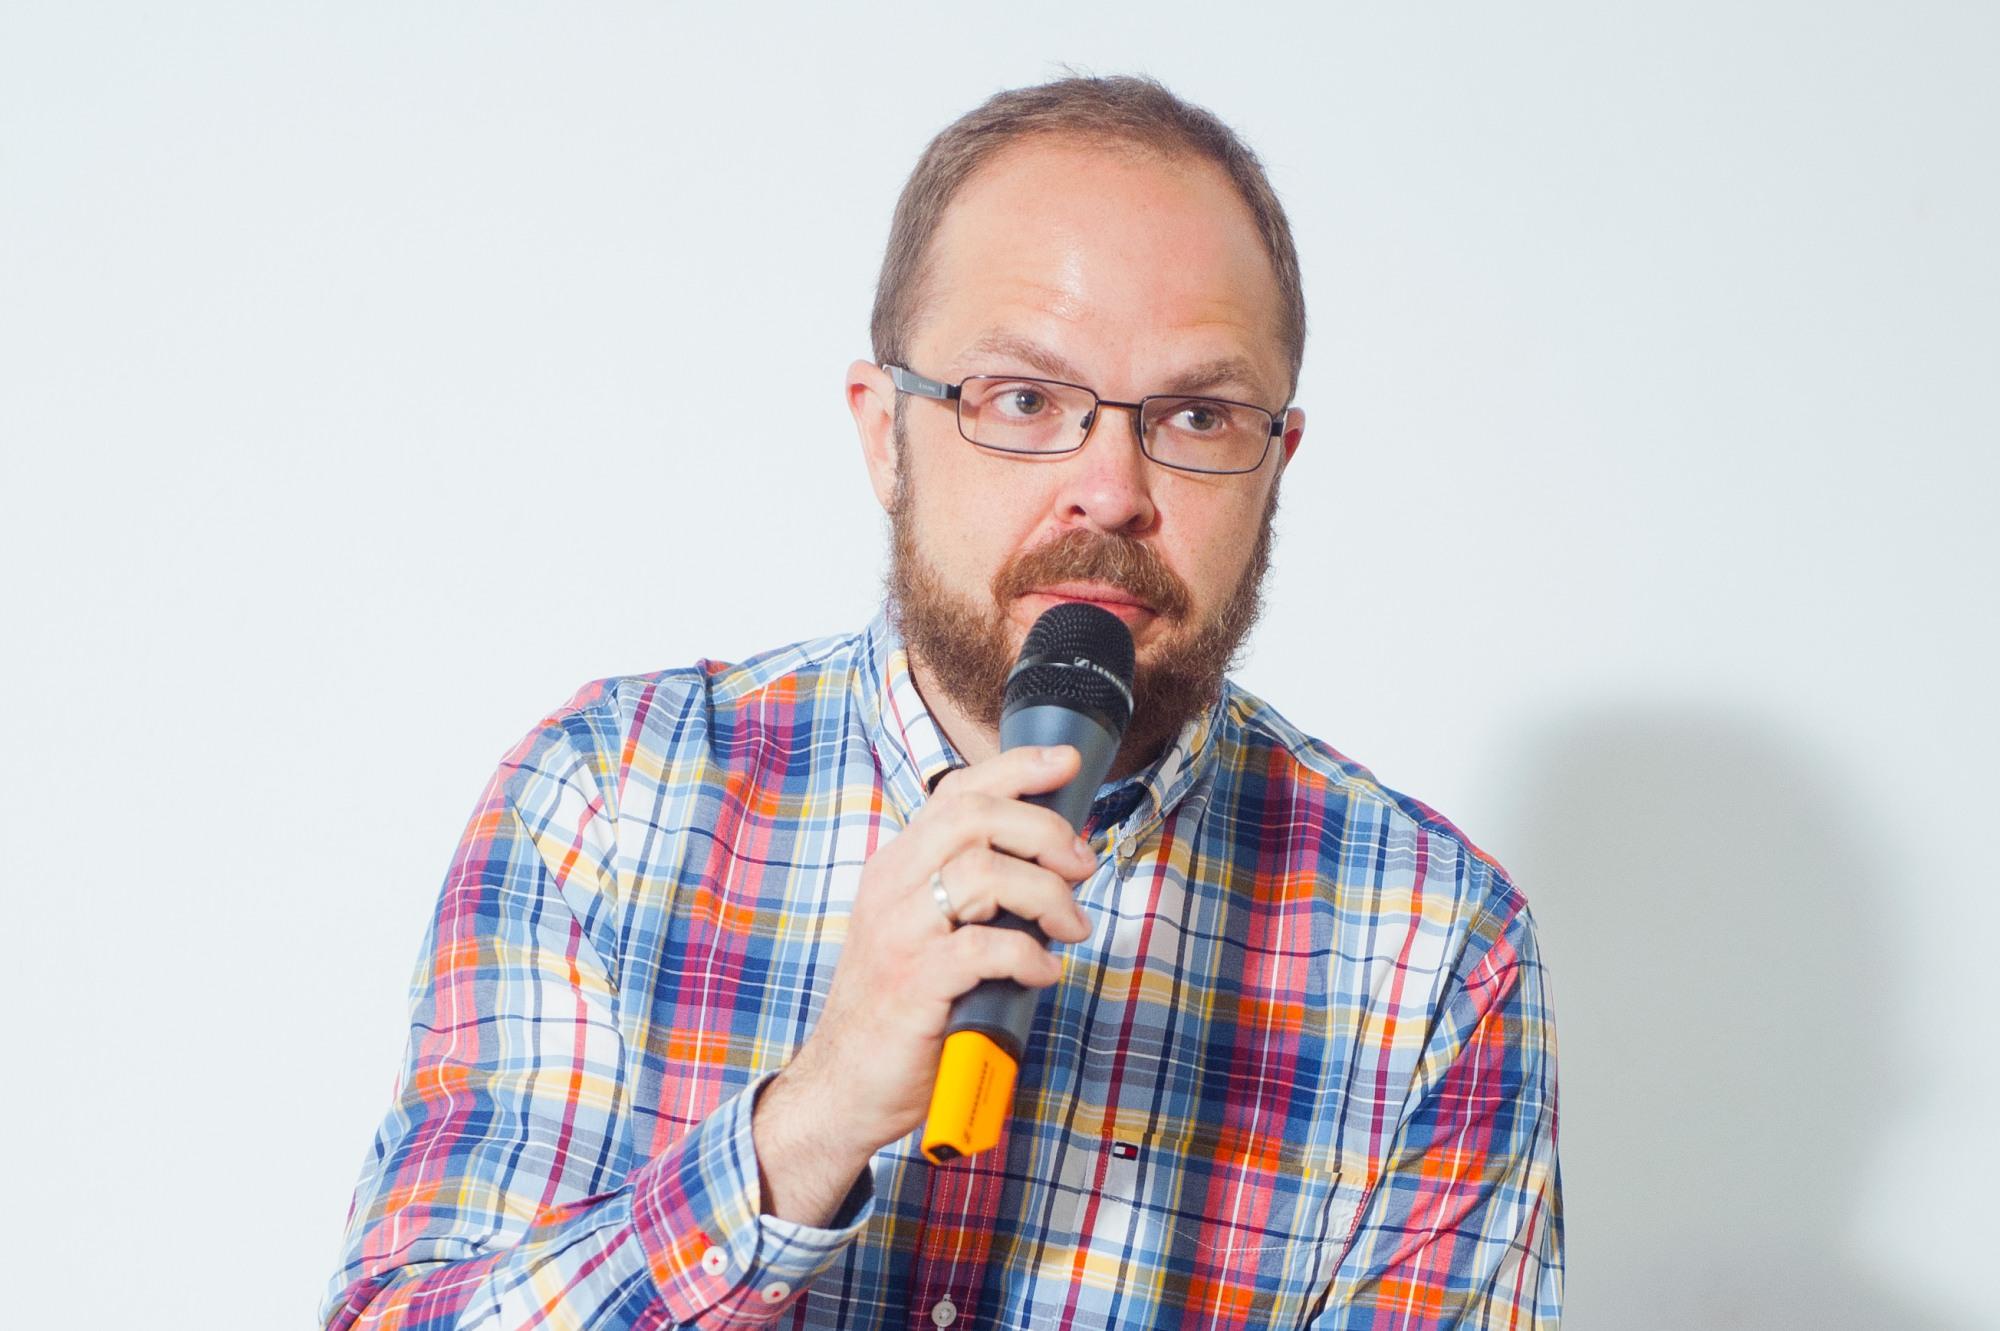 Алексей Куракин, Медиа Группа Украина